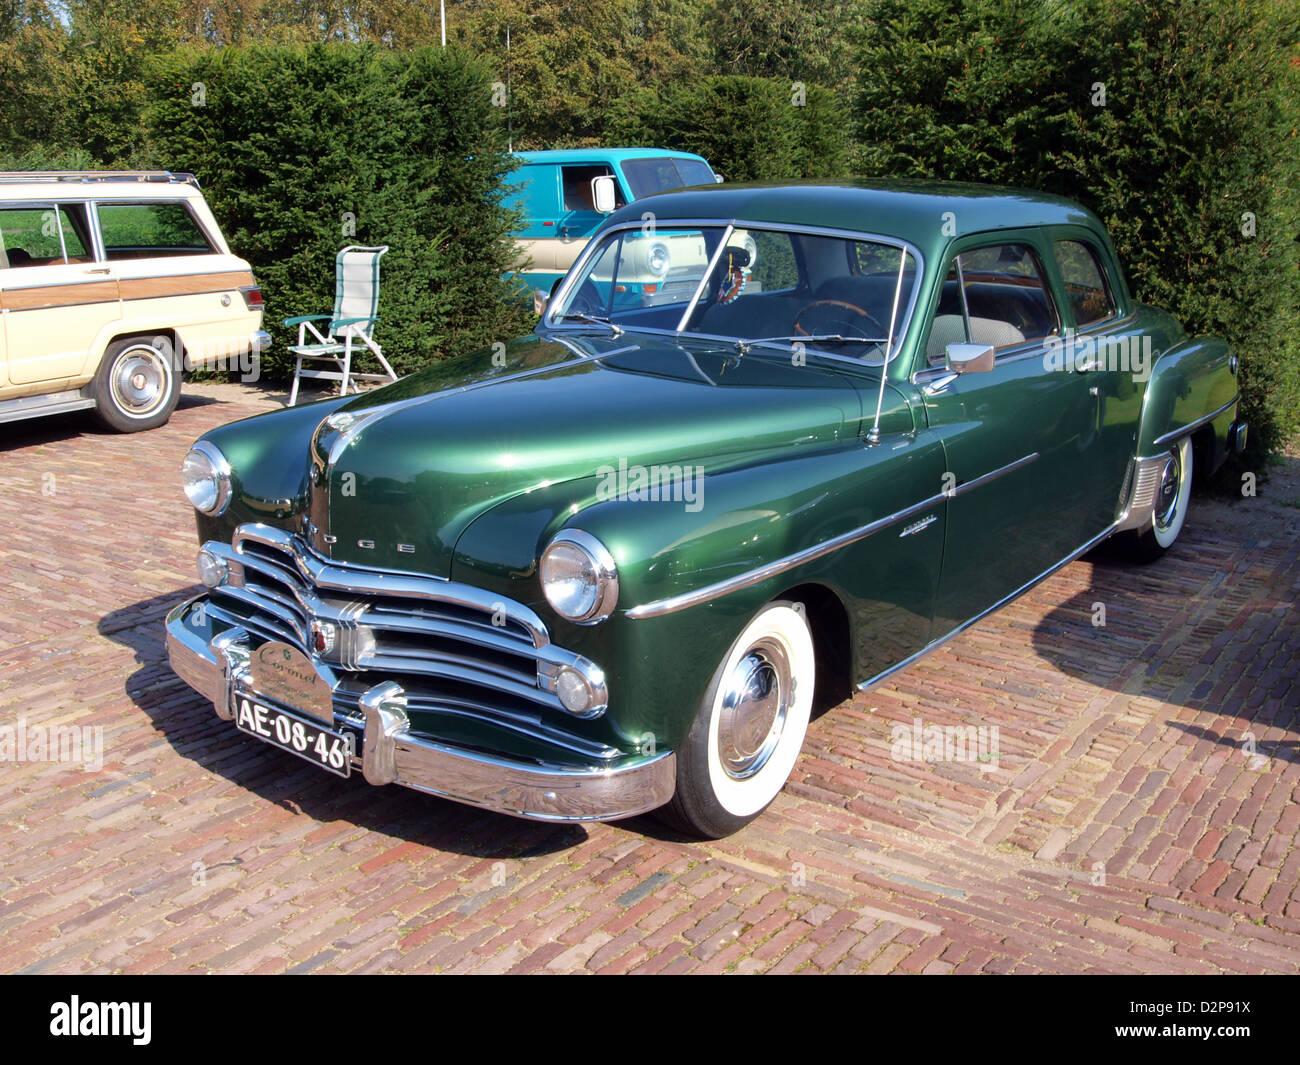 Dodge Coronet Stock Photos Images Alamy 1950s Cars 1950